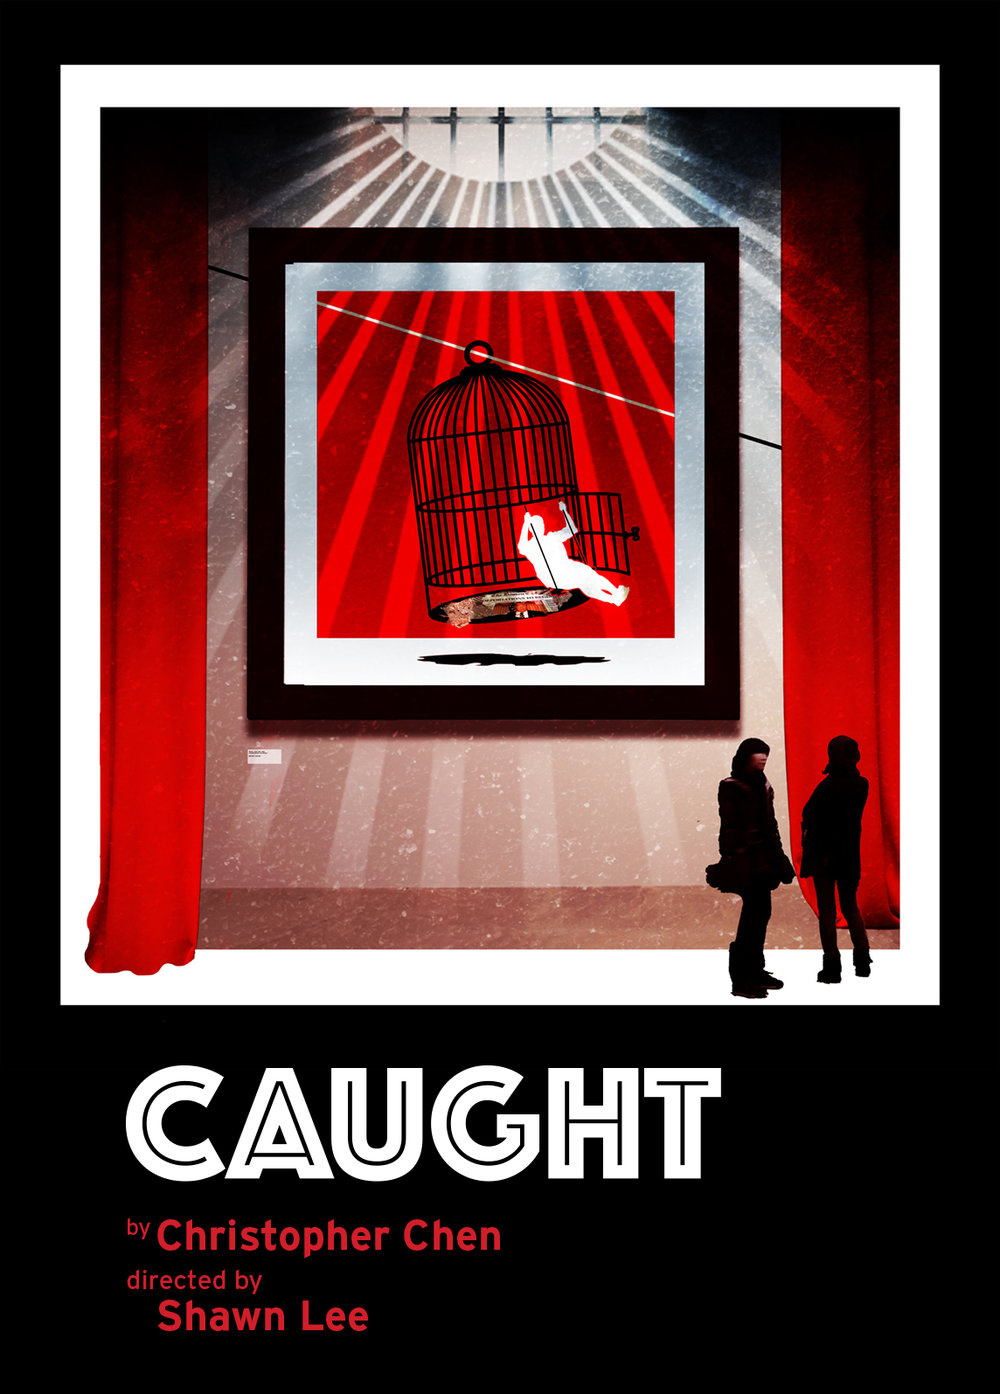 Caught-small.jpg